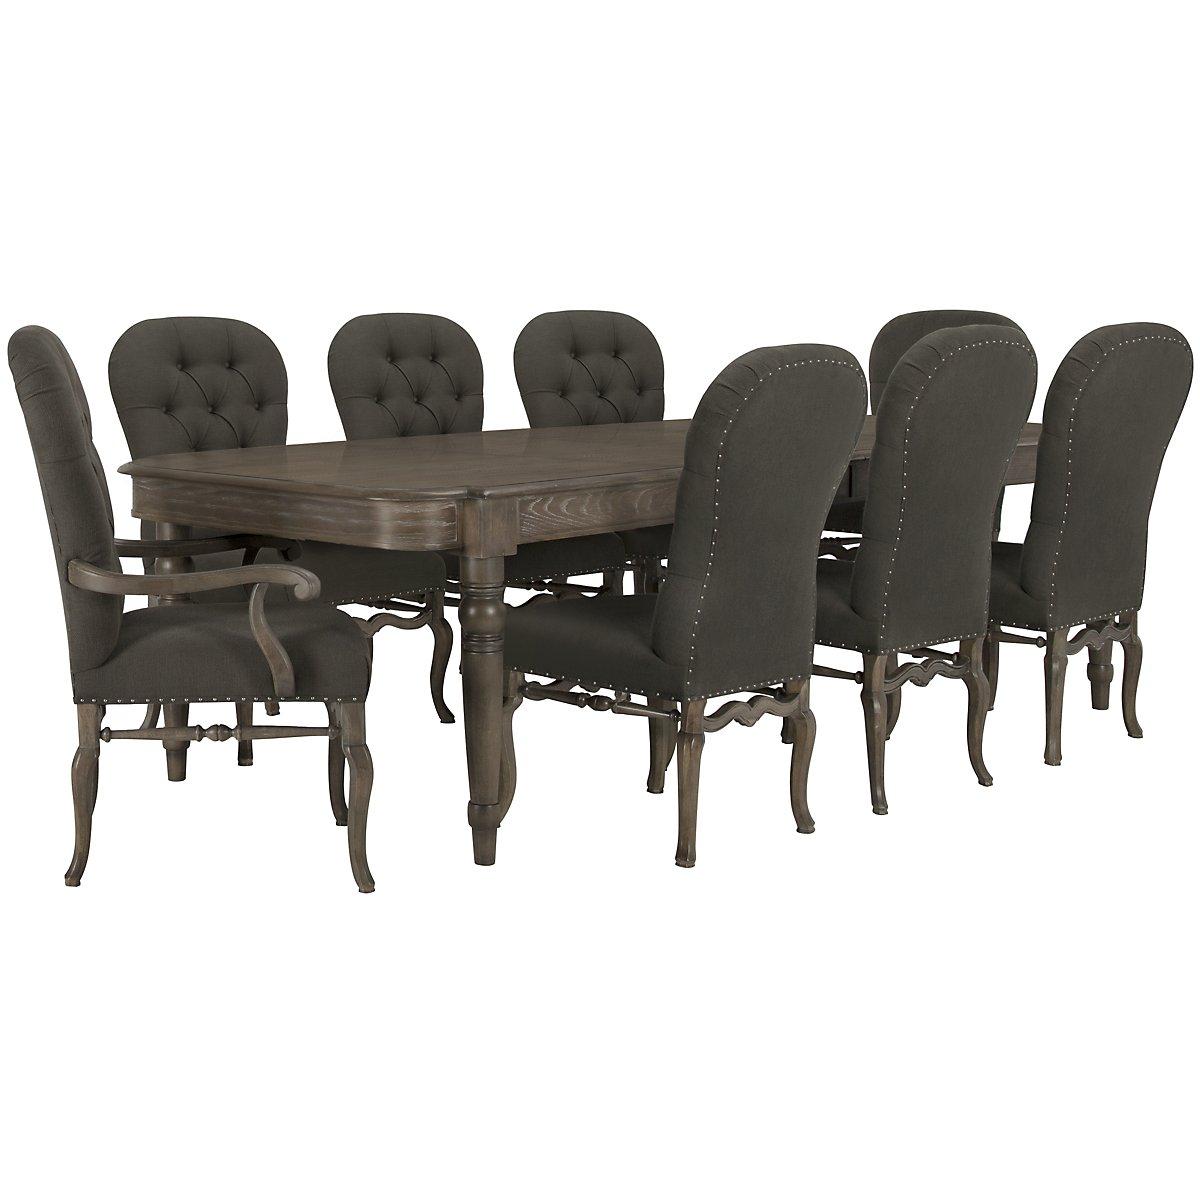 City furniture belgian oak light tone upholstered side chair for Oak bedroom furniture 0 finance